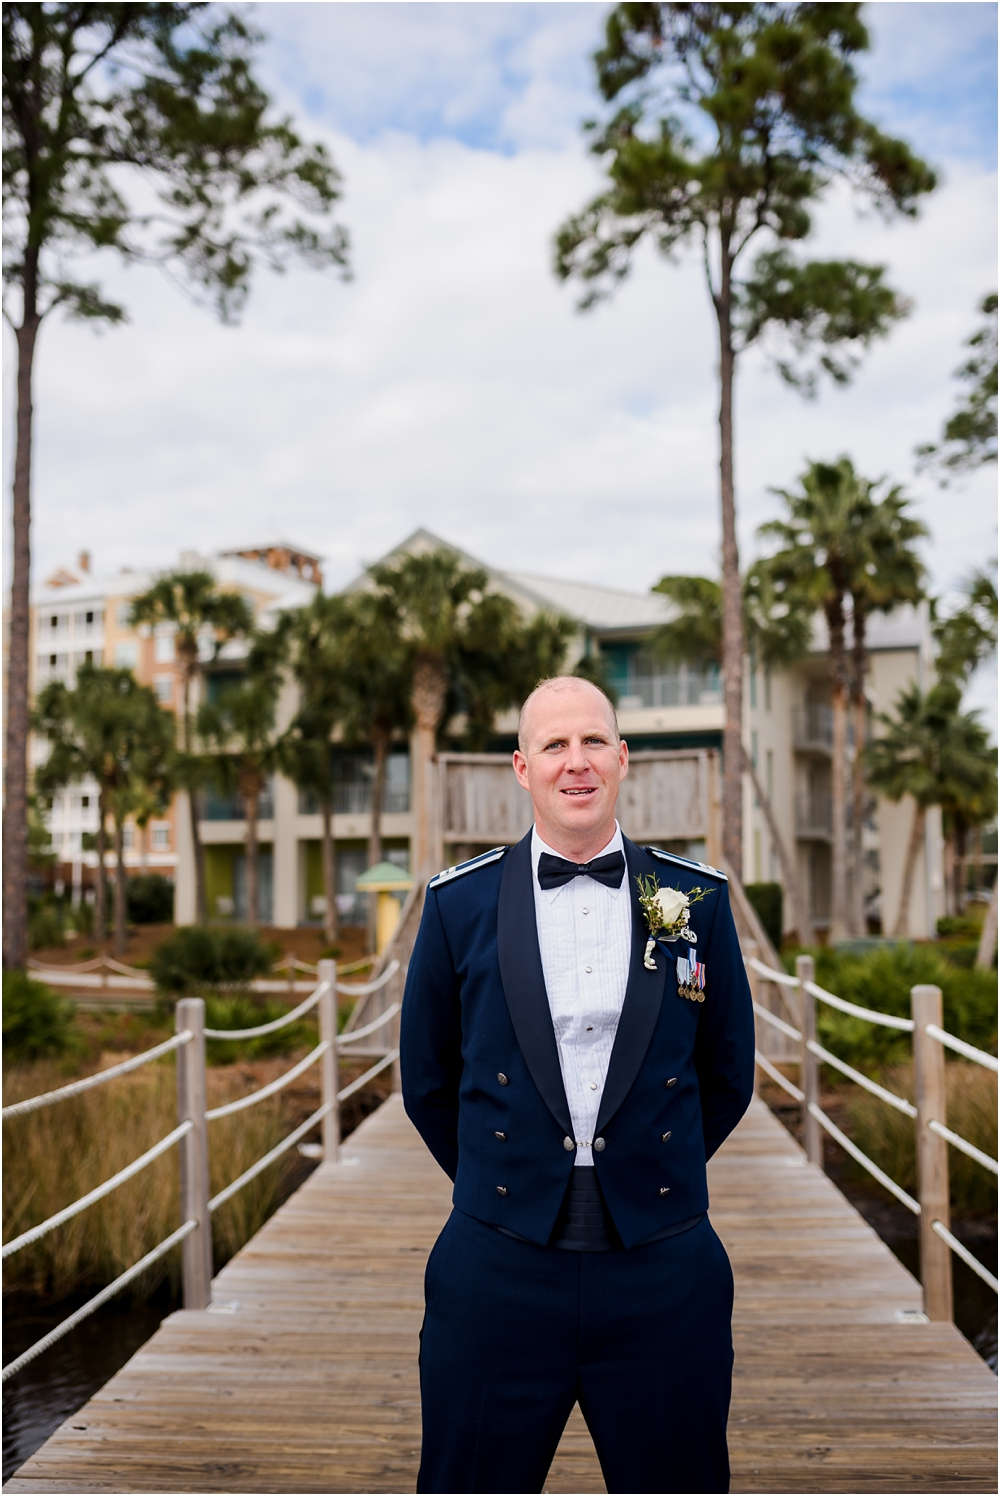 quinn-bay-point-sheraton-florida-wedding-photographer-kiersten-grant-62.jpg